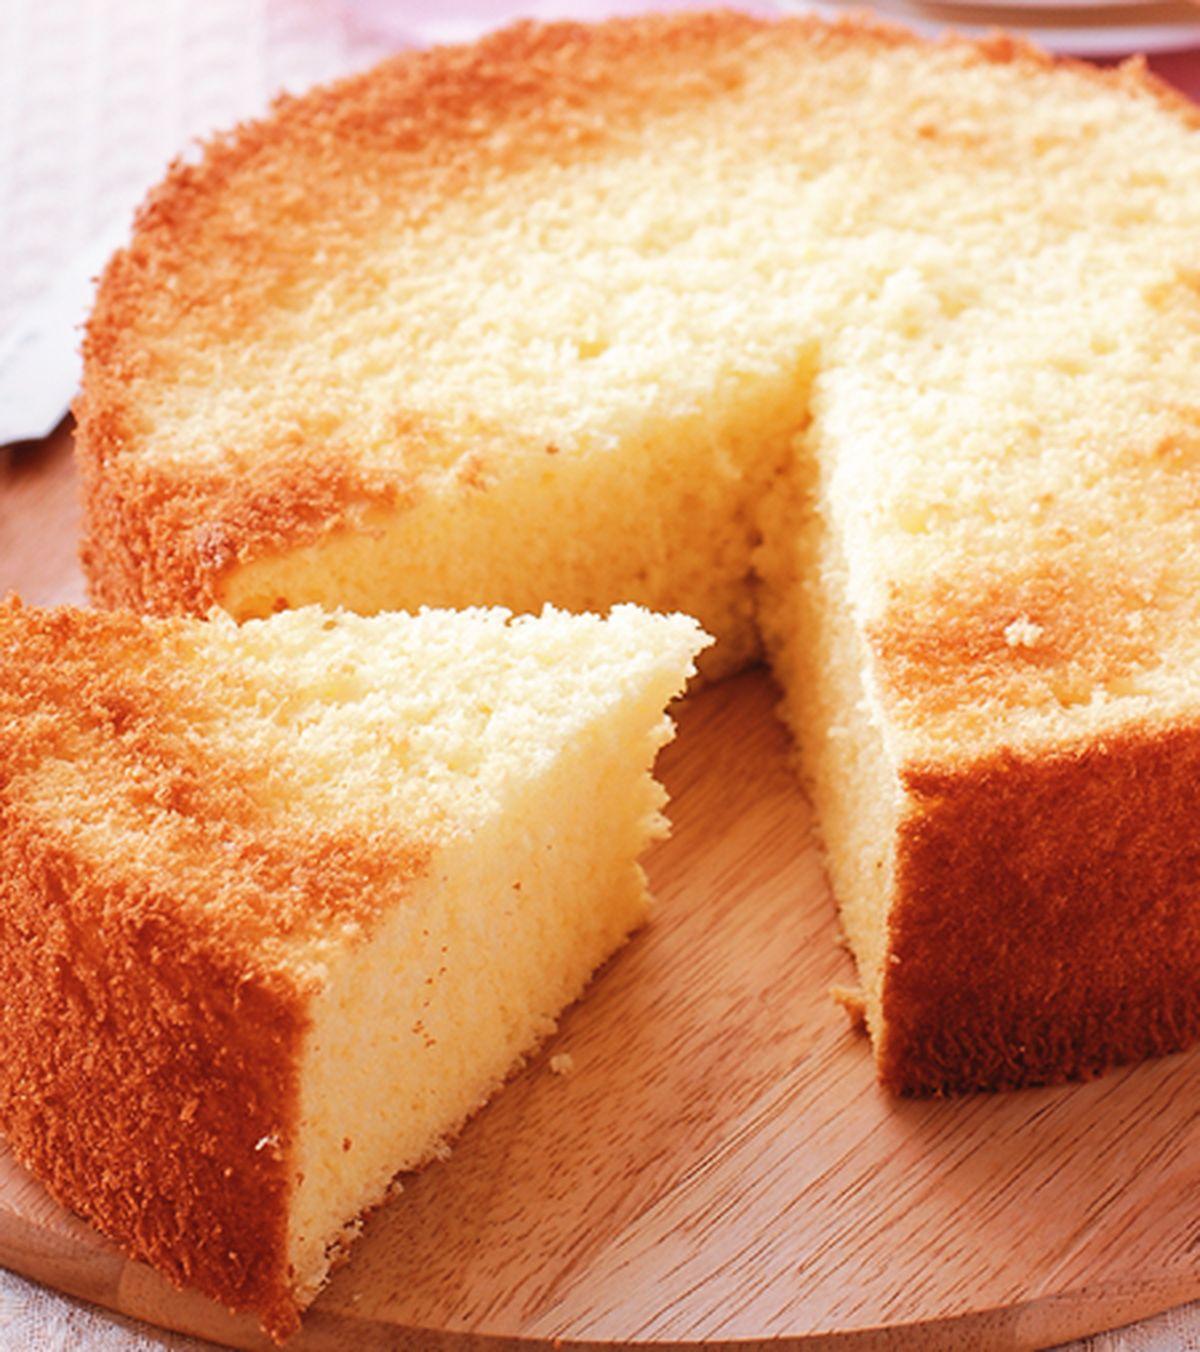 食譜:海綿蛋糕